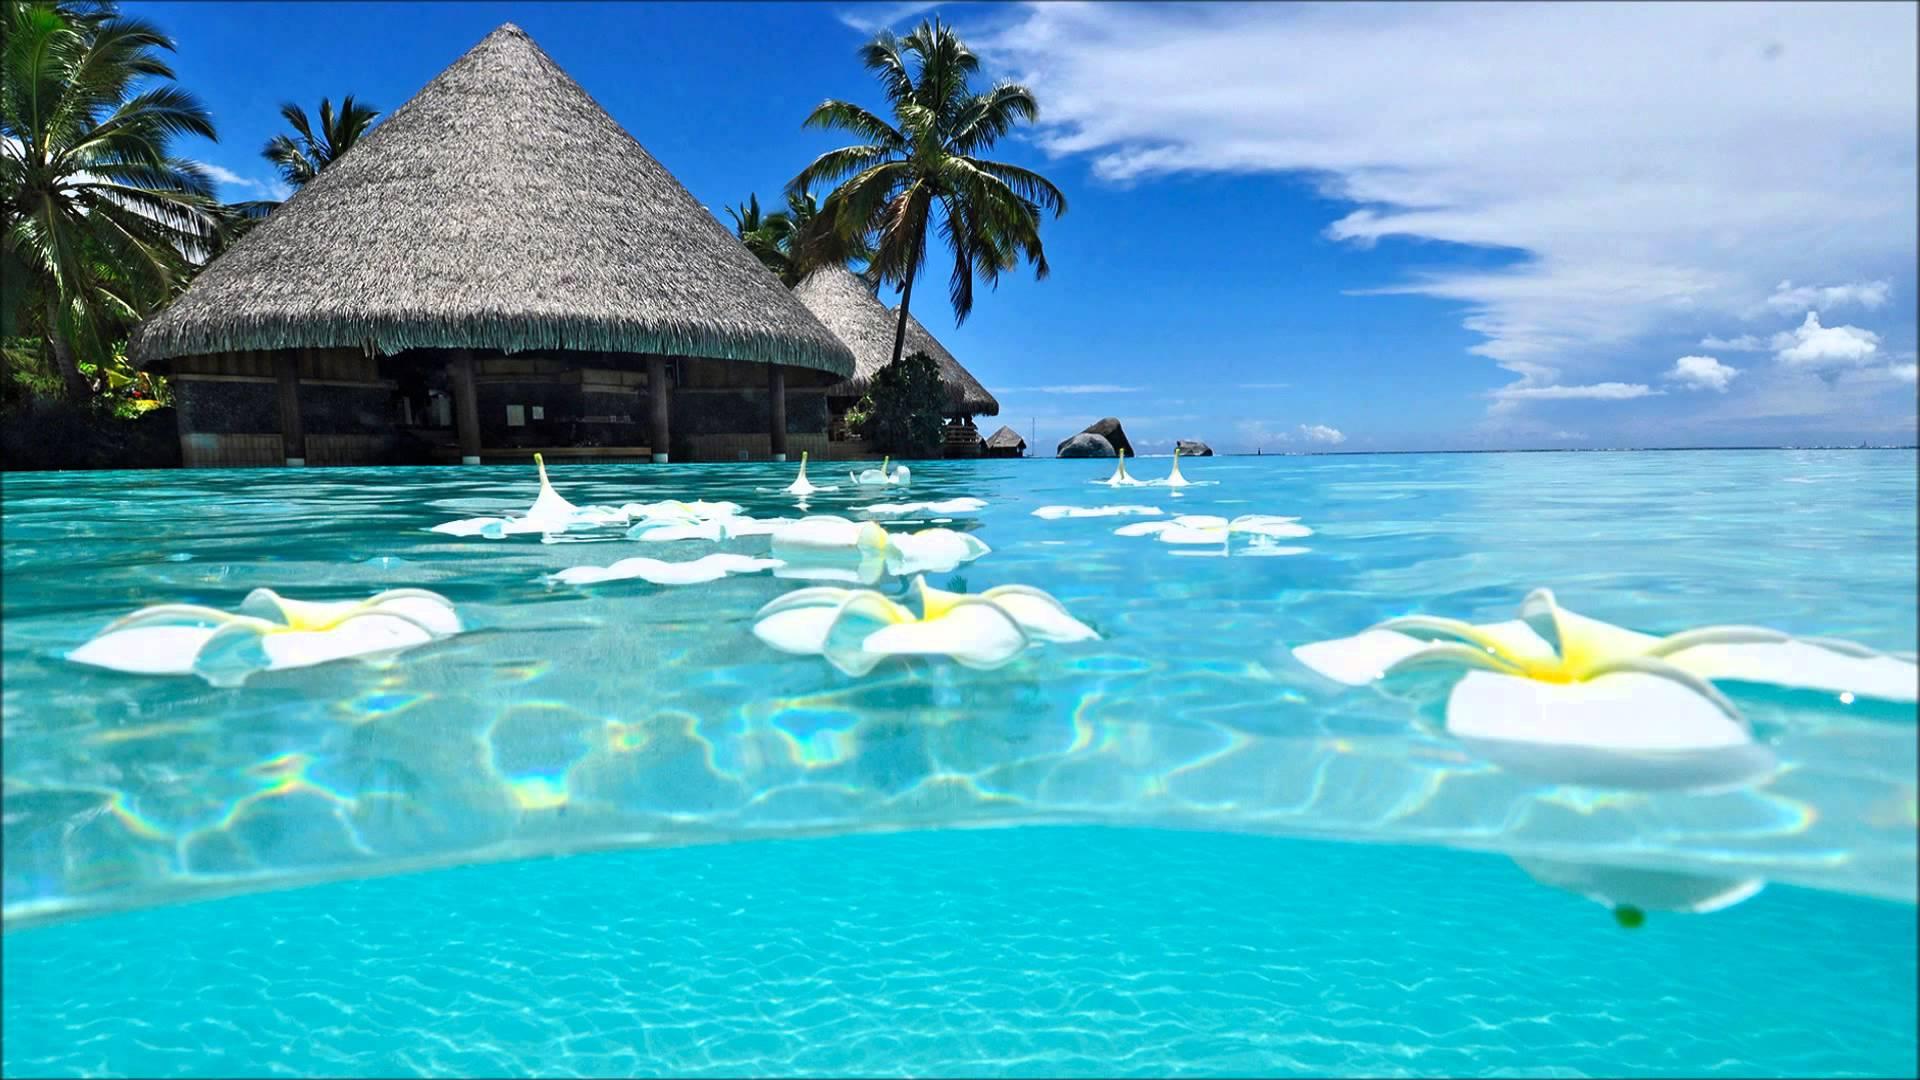 Tropic water photo